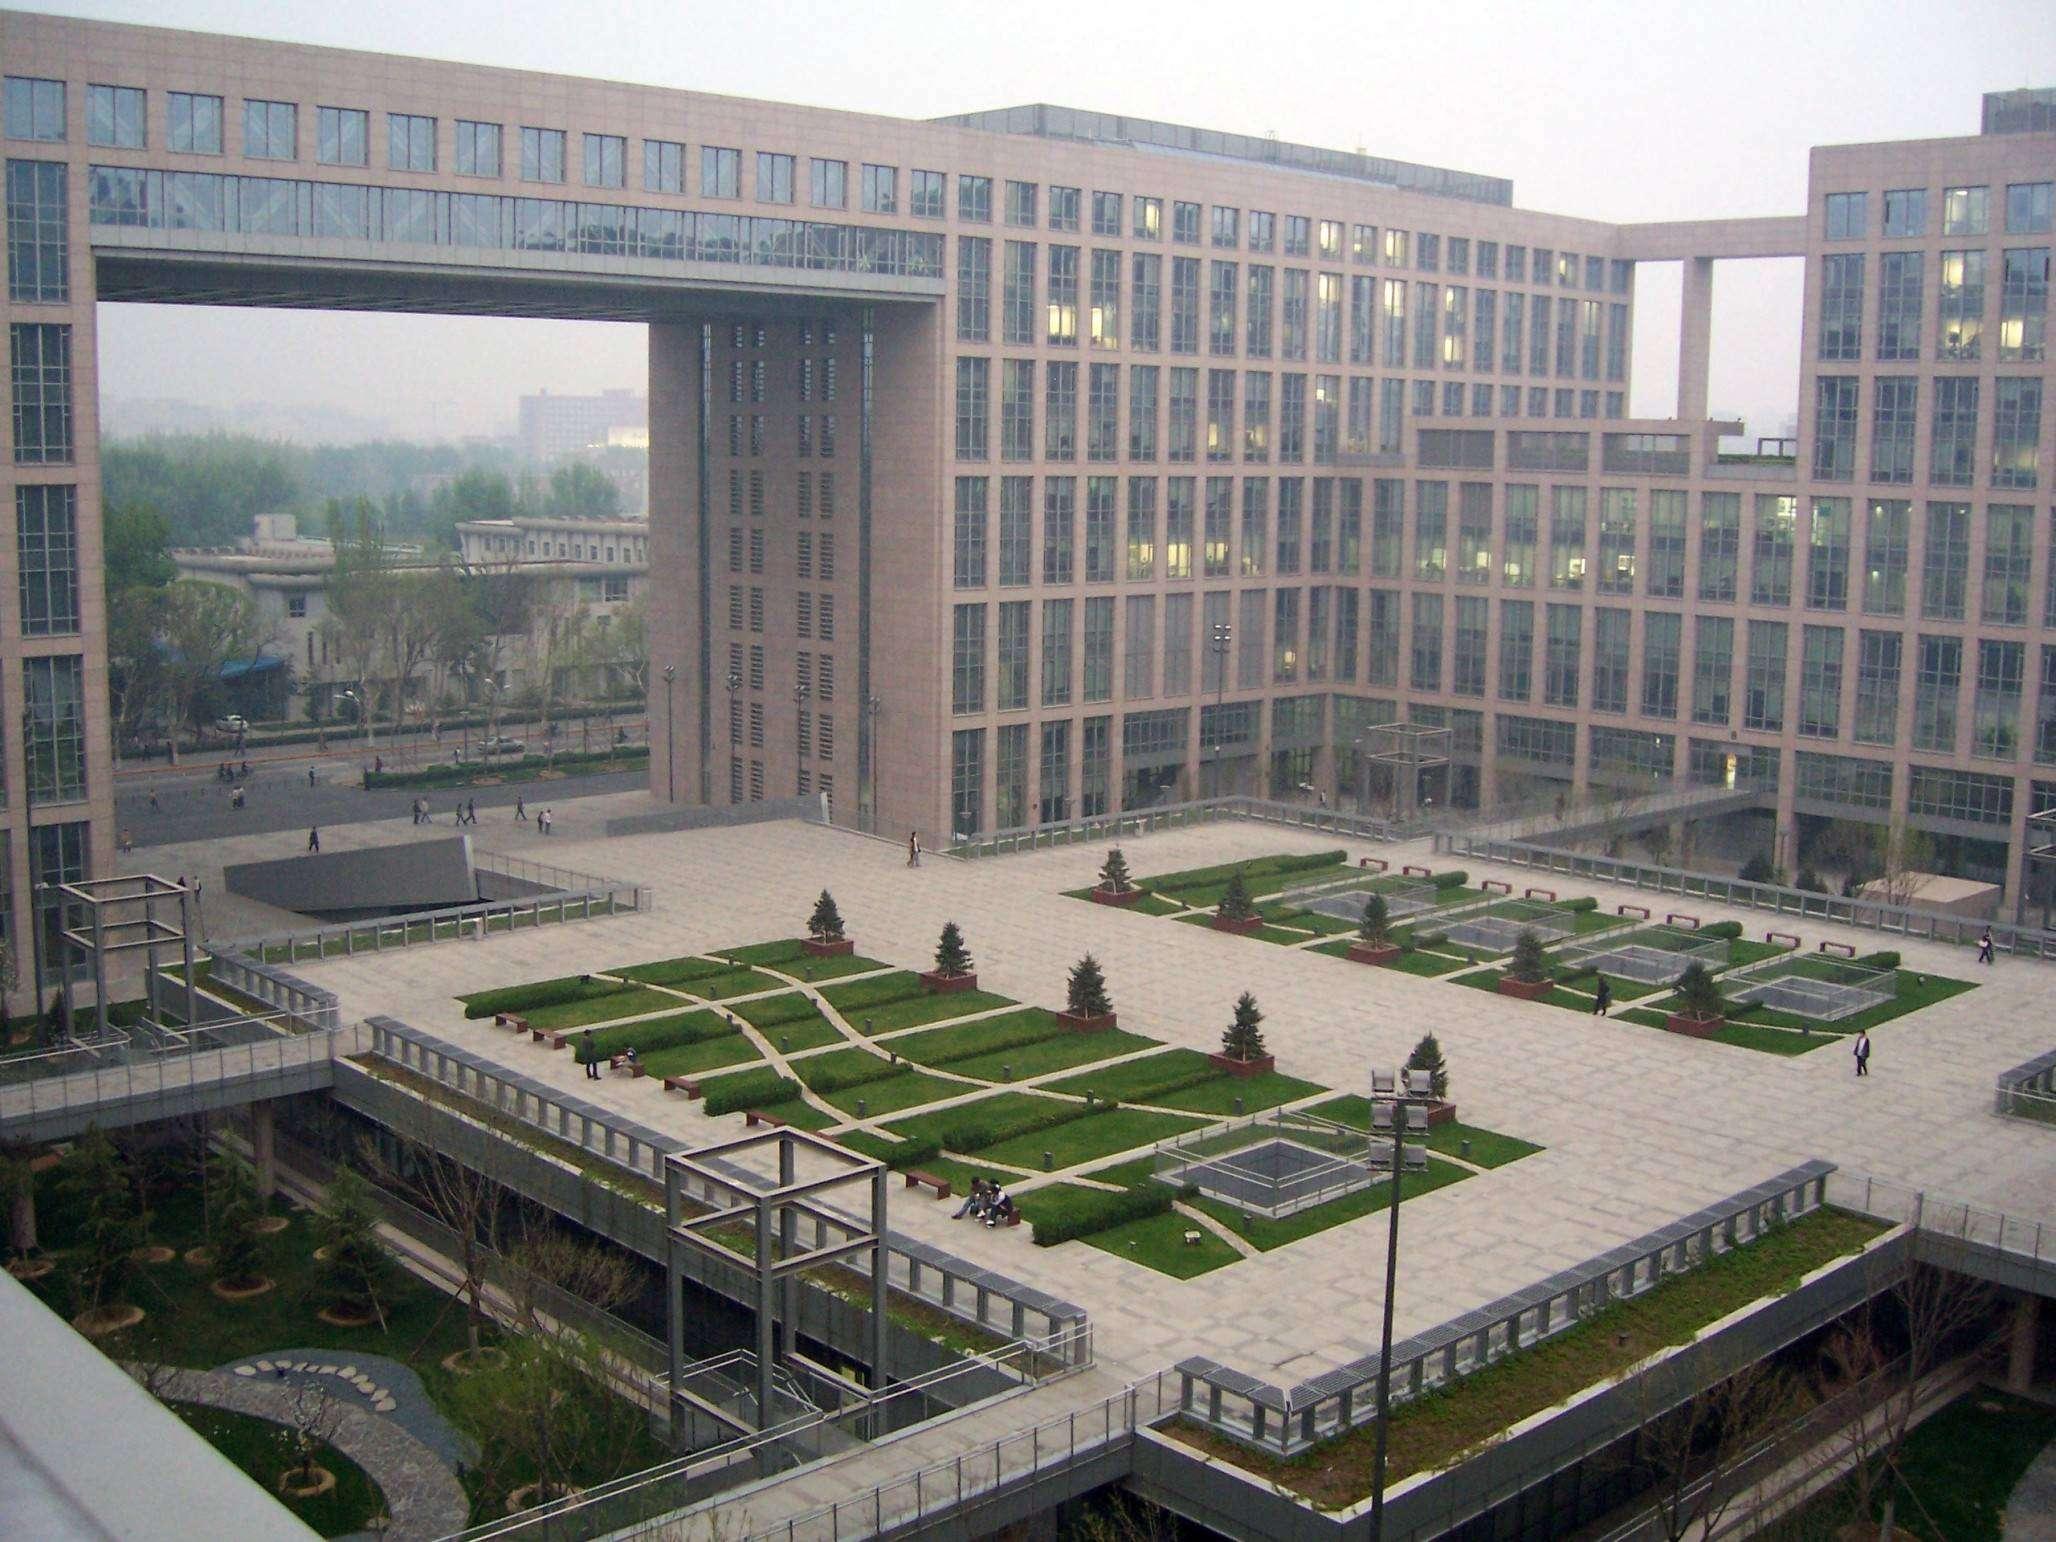 https://i0.wp.com/www.redeangola.info/wp-content/uploads/2015/11/universidade-beihang-china_brianchenming_cc2-.jpg